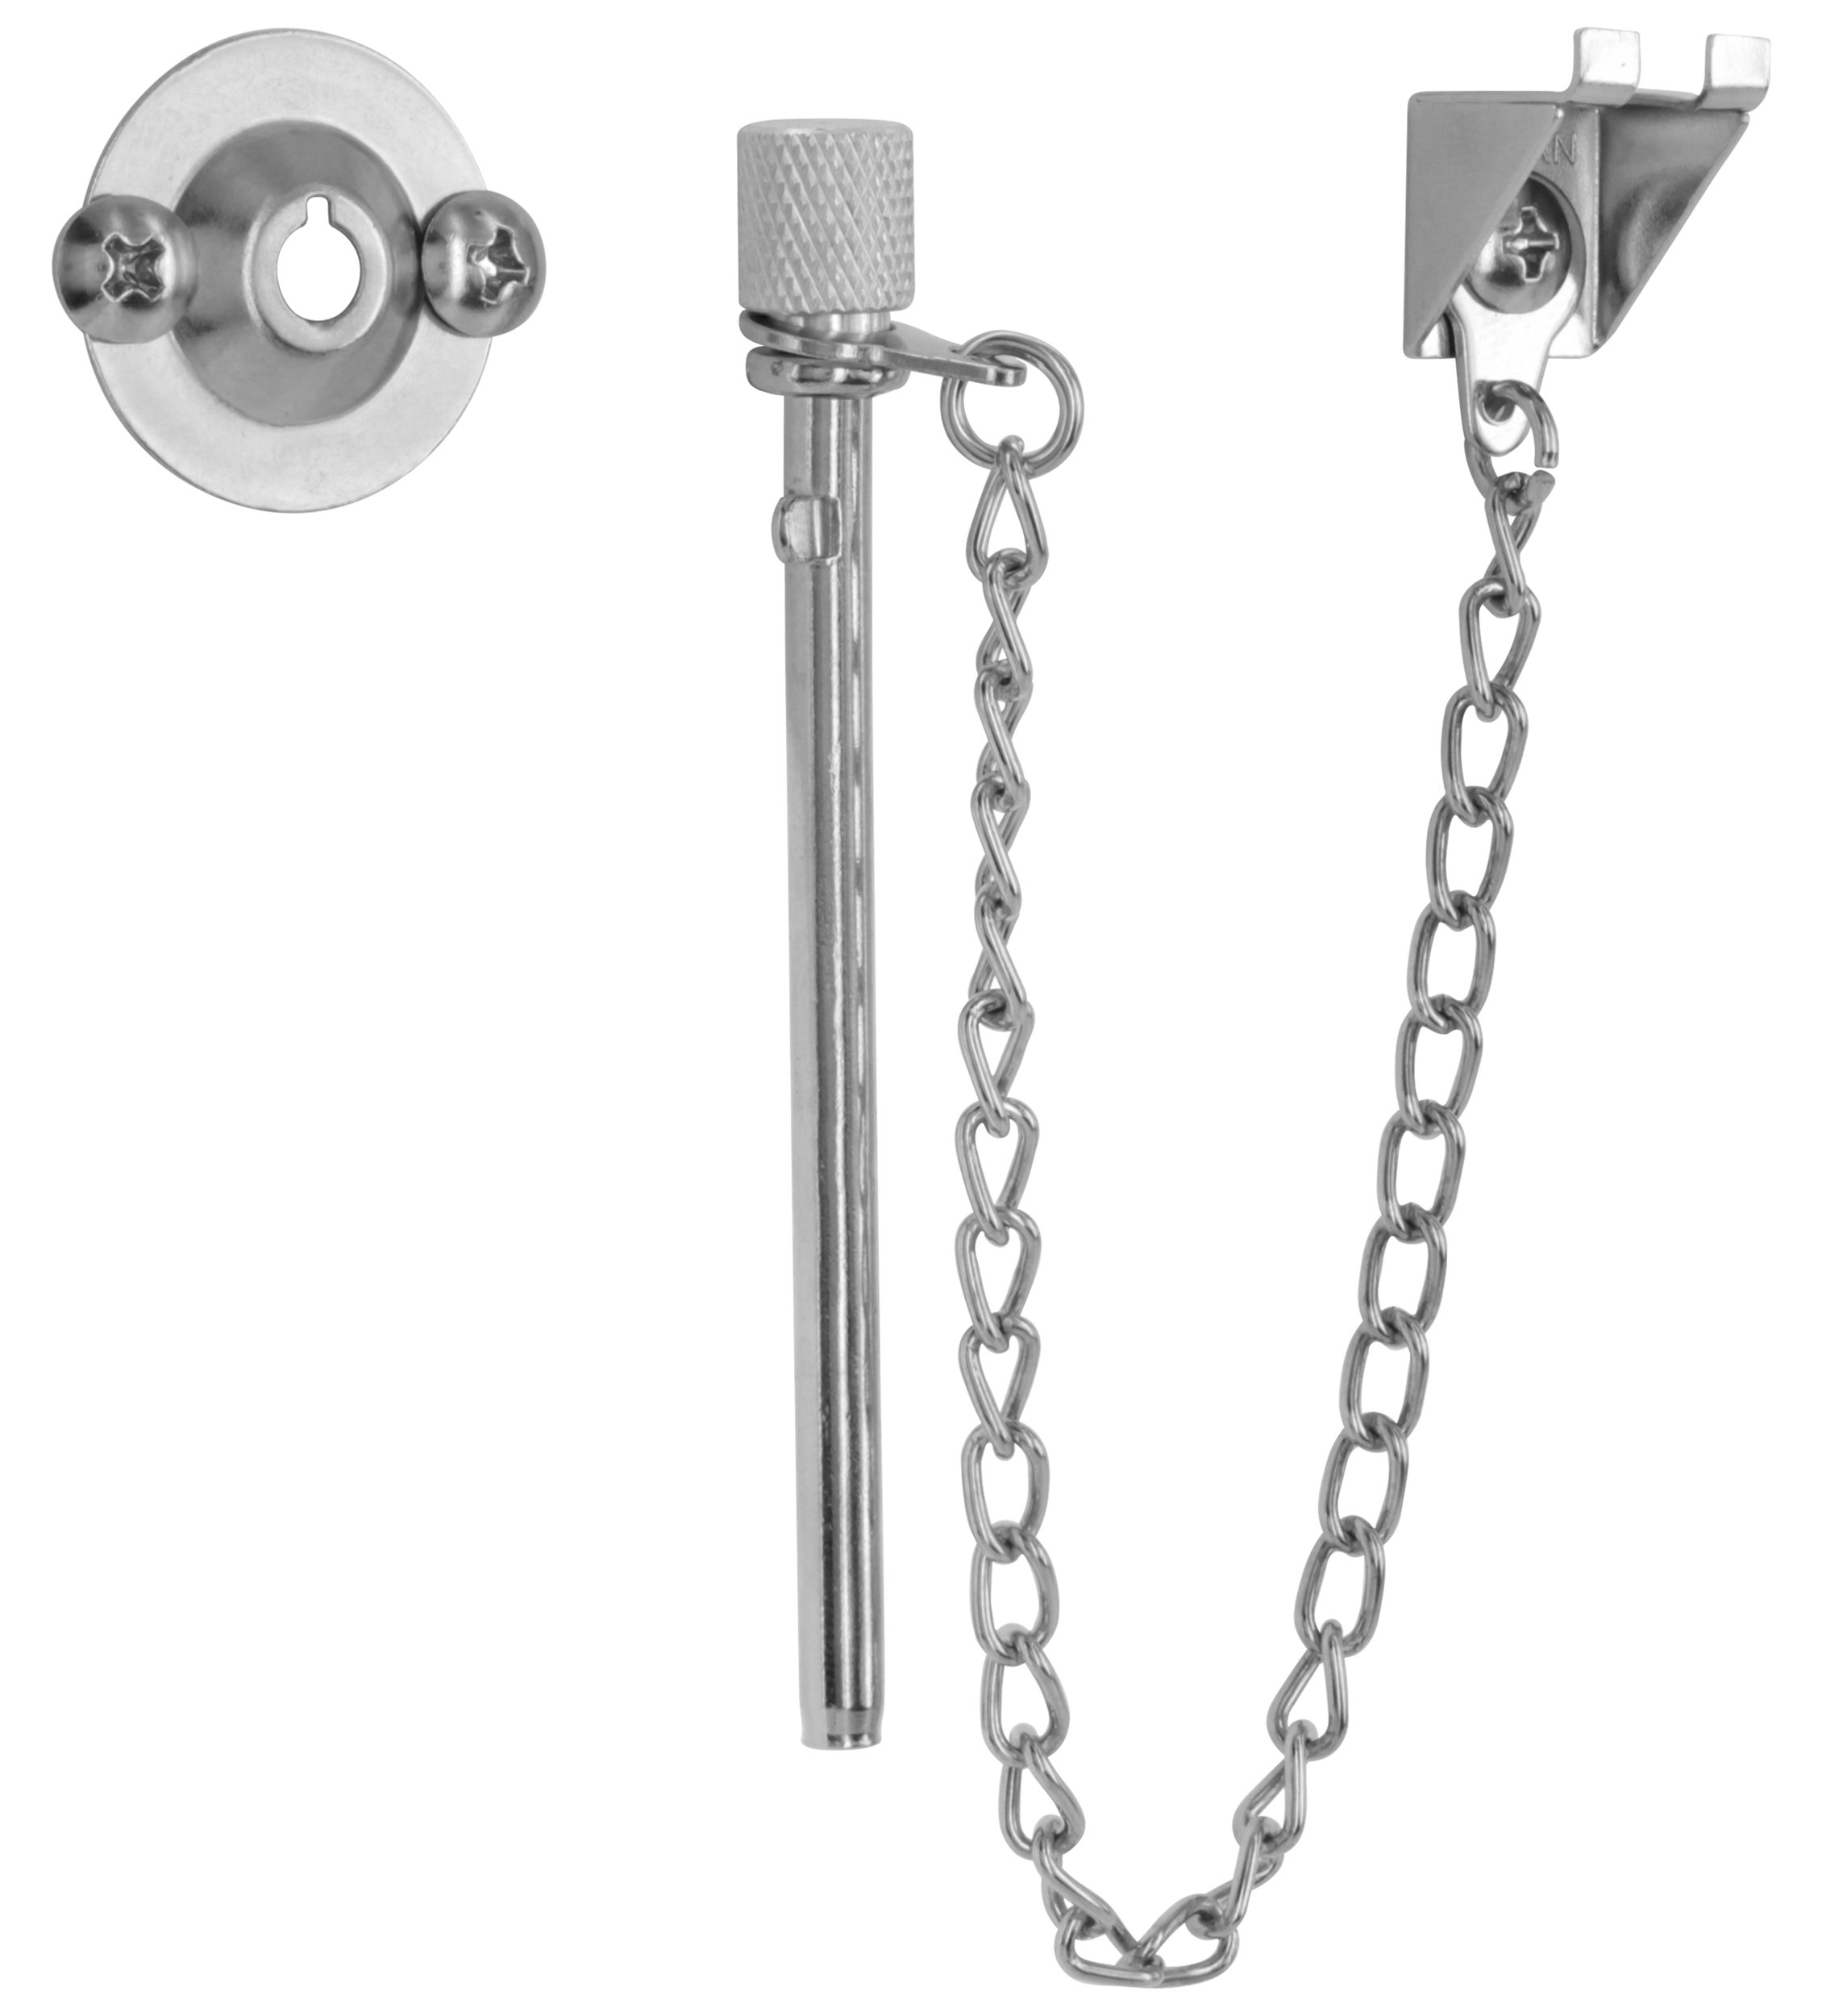 "Ram-Pro Extra Long 3-1/2"" Window Security Guard Pin Lock Set for Sliding Doors & Windows"